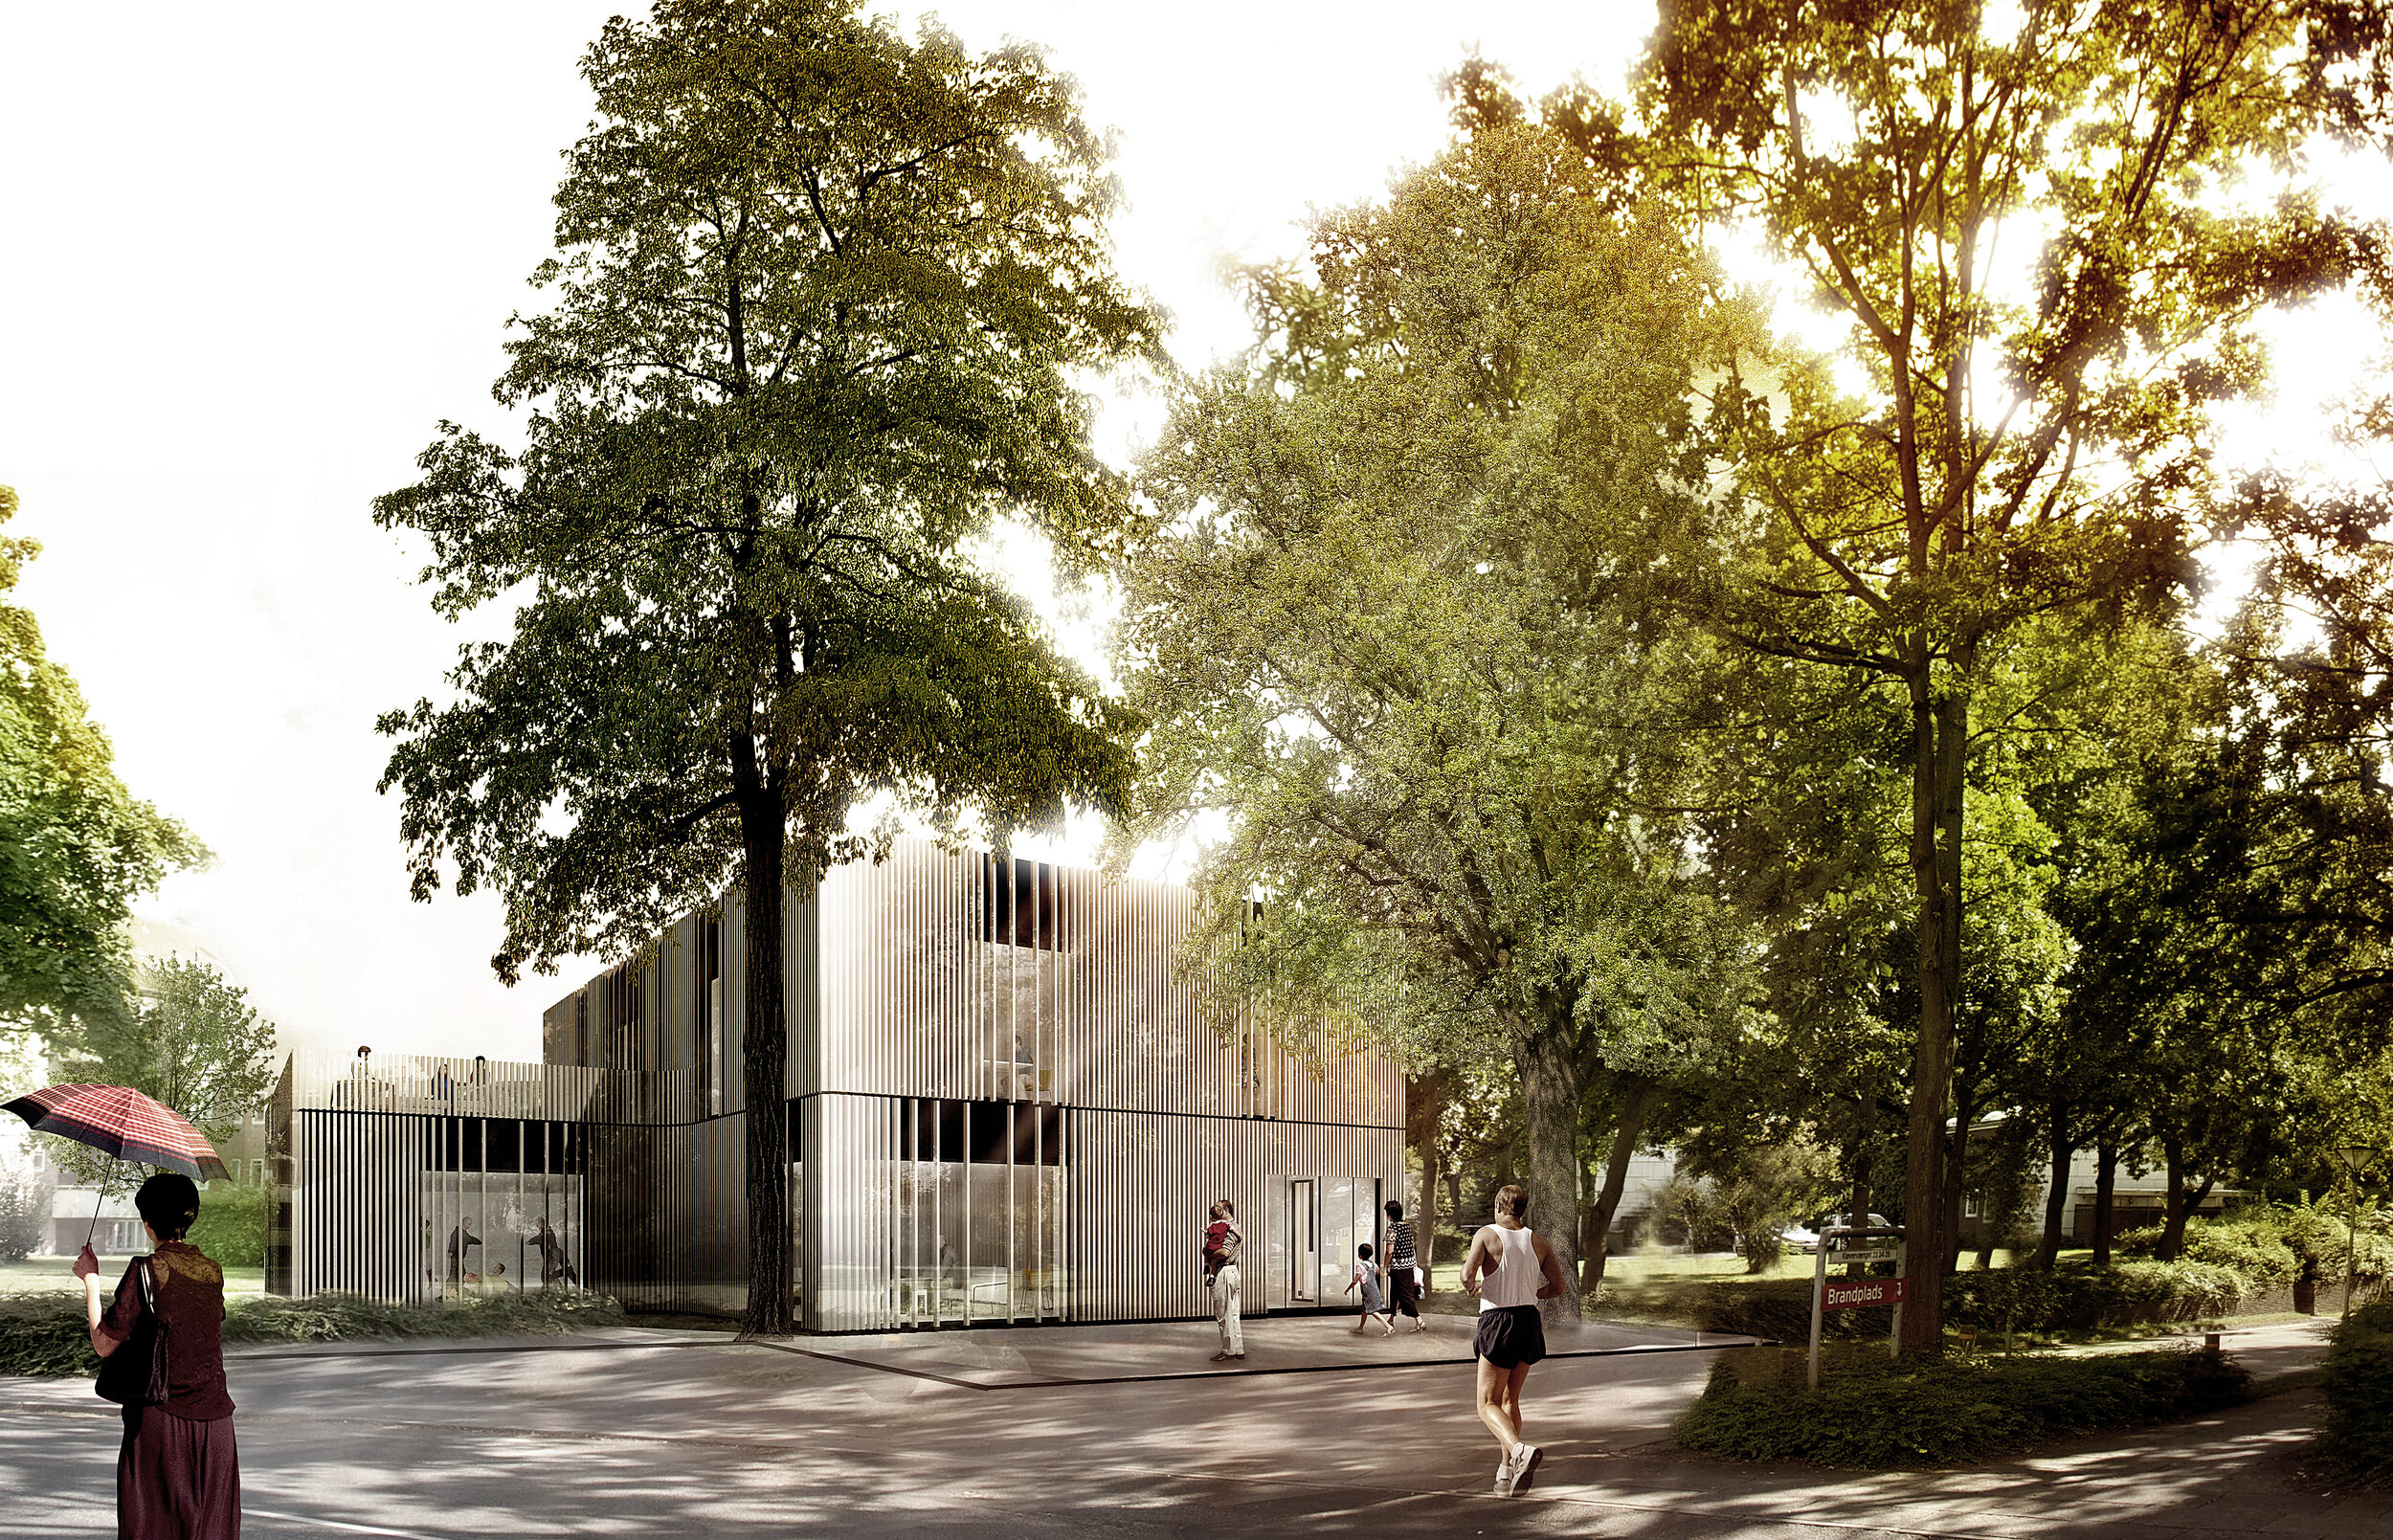 - Livsrum Odense